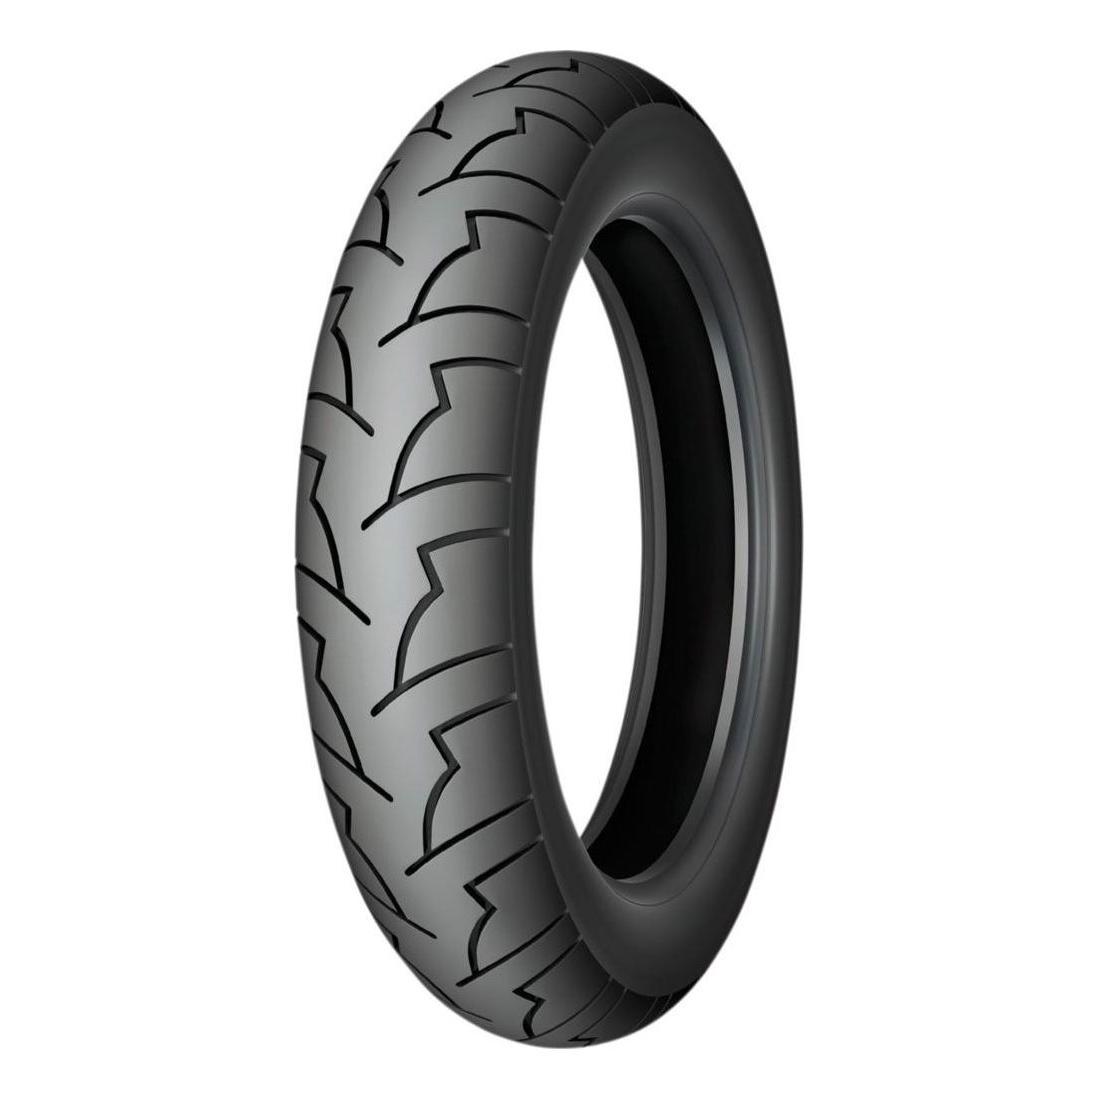 Pneu moto arrière Michelin Pilot Activ 130/80-17 65H TL/TT